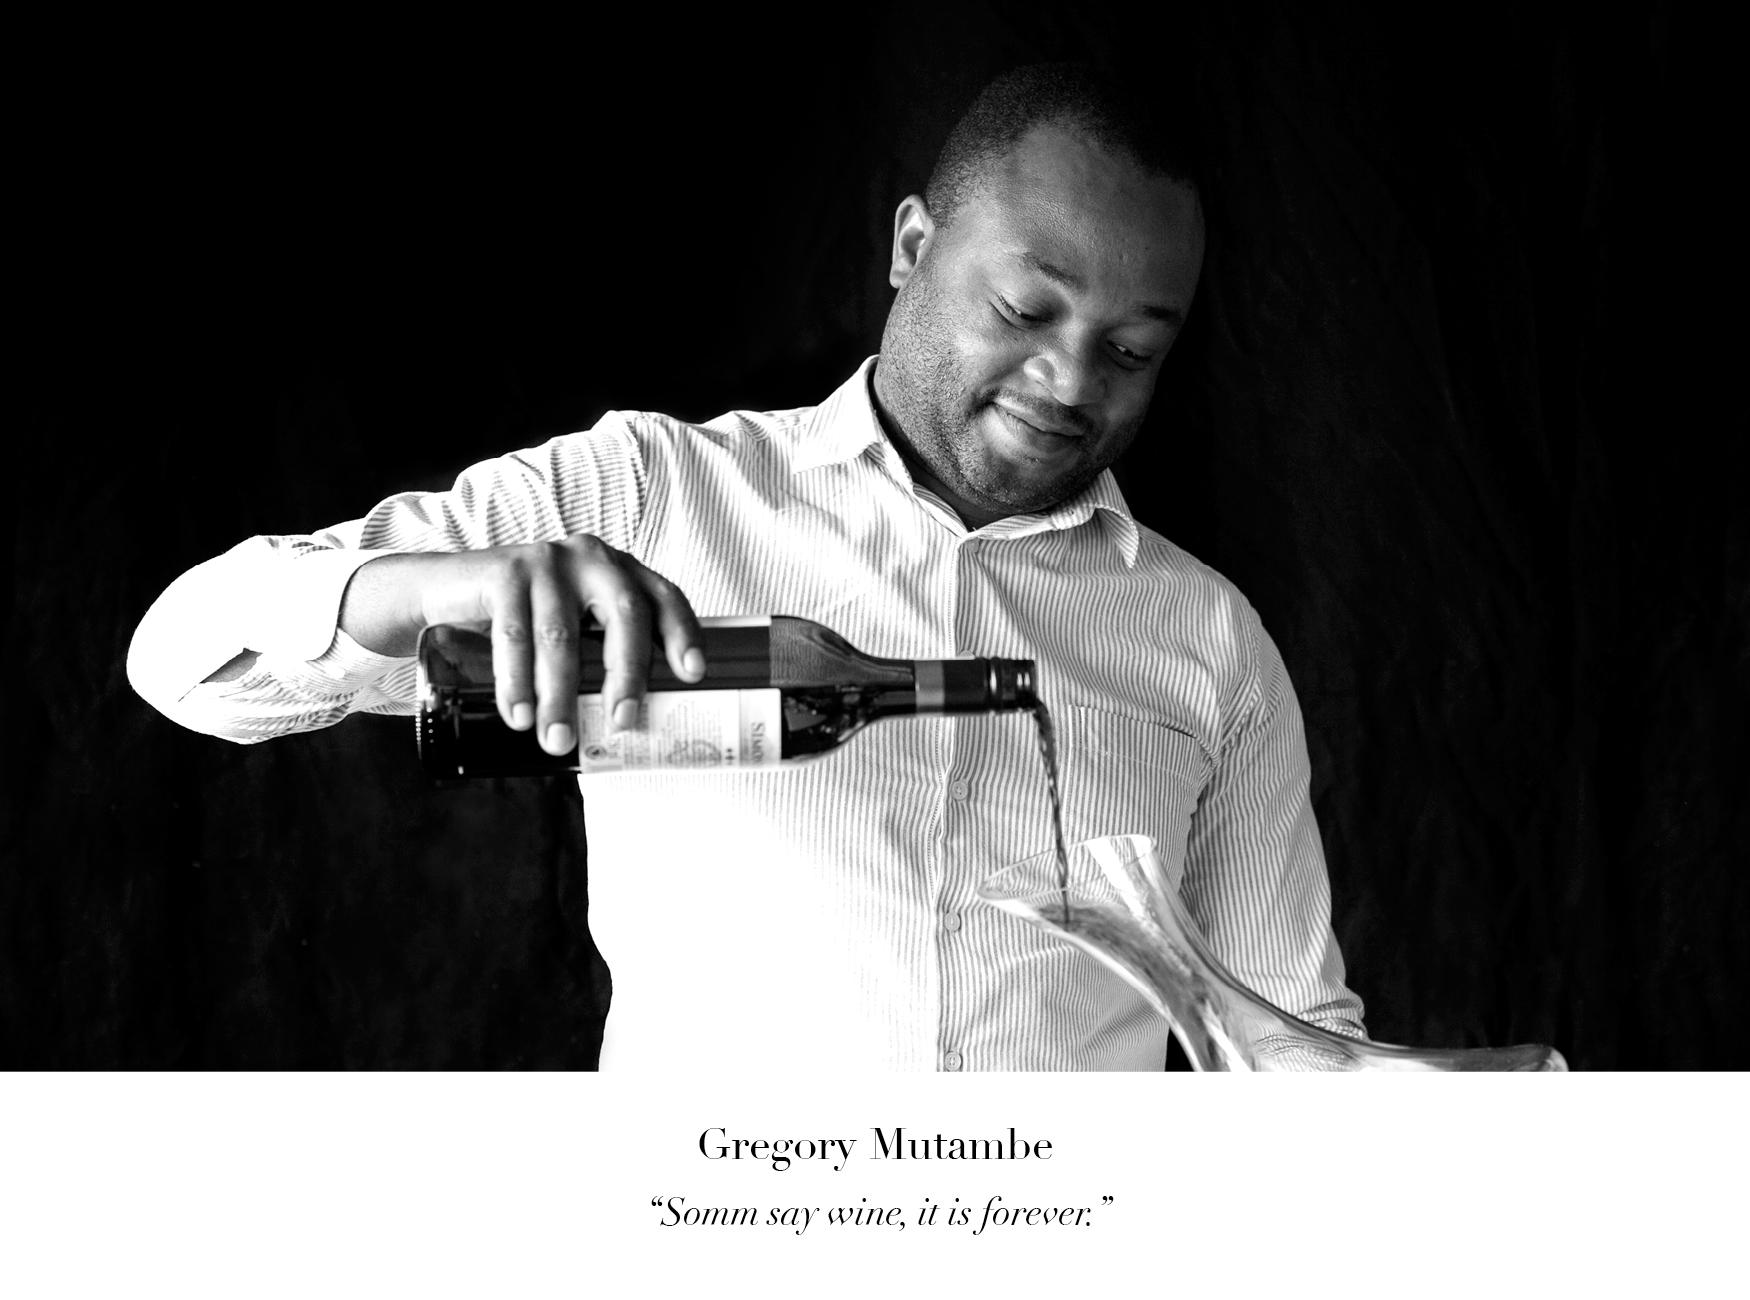 Gregory Mutambe Wine of the Month Club wine judge